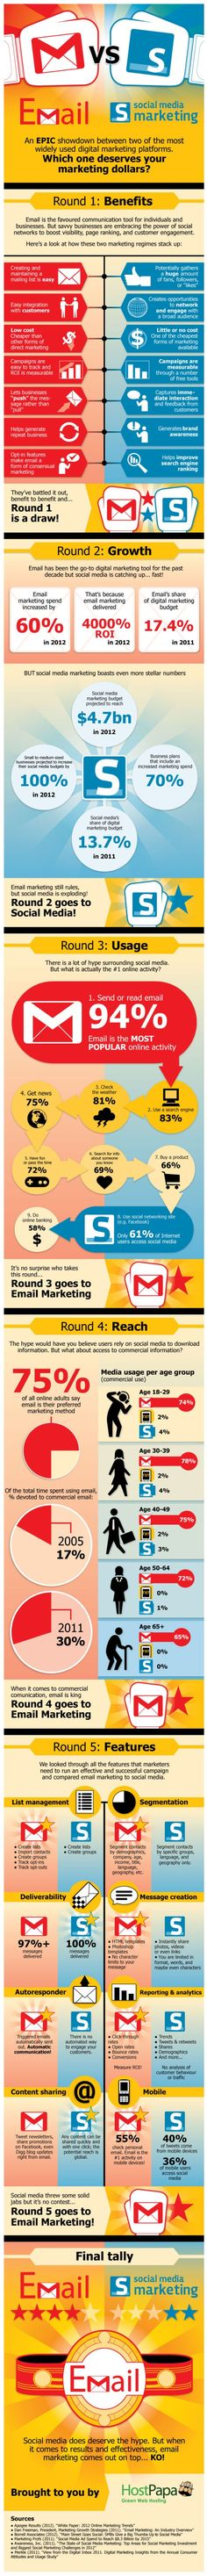 Infographic: e-mail versus social - Emerce